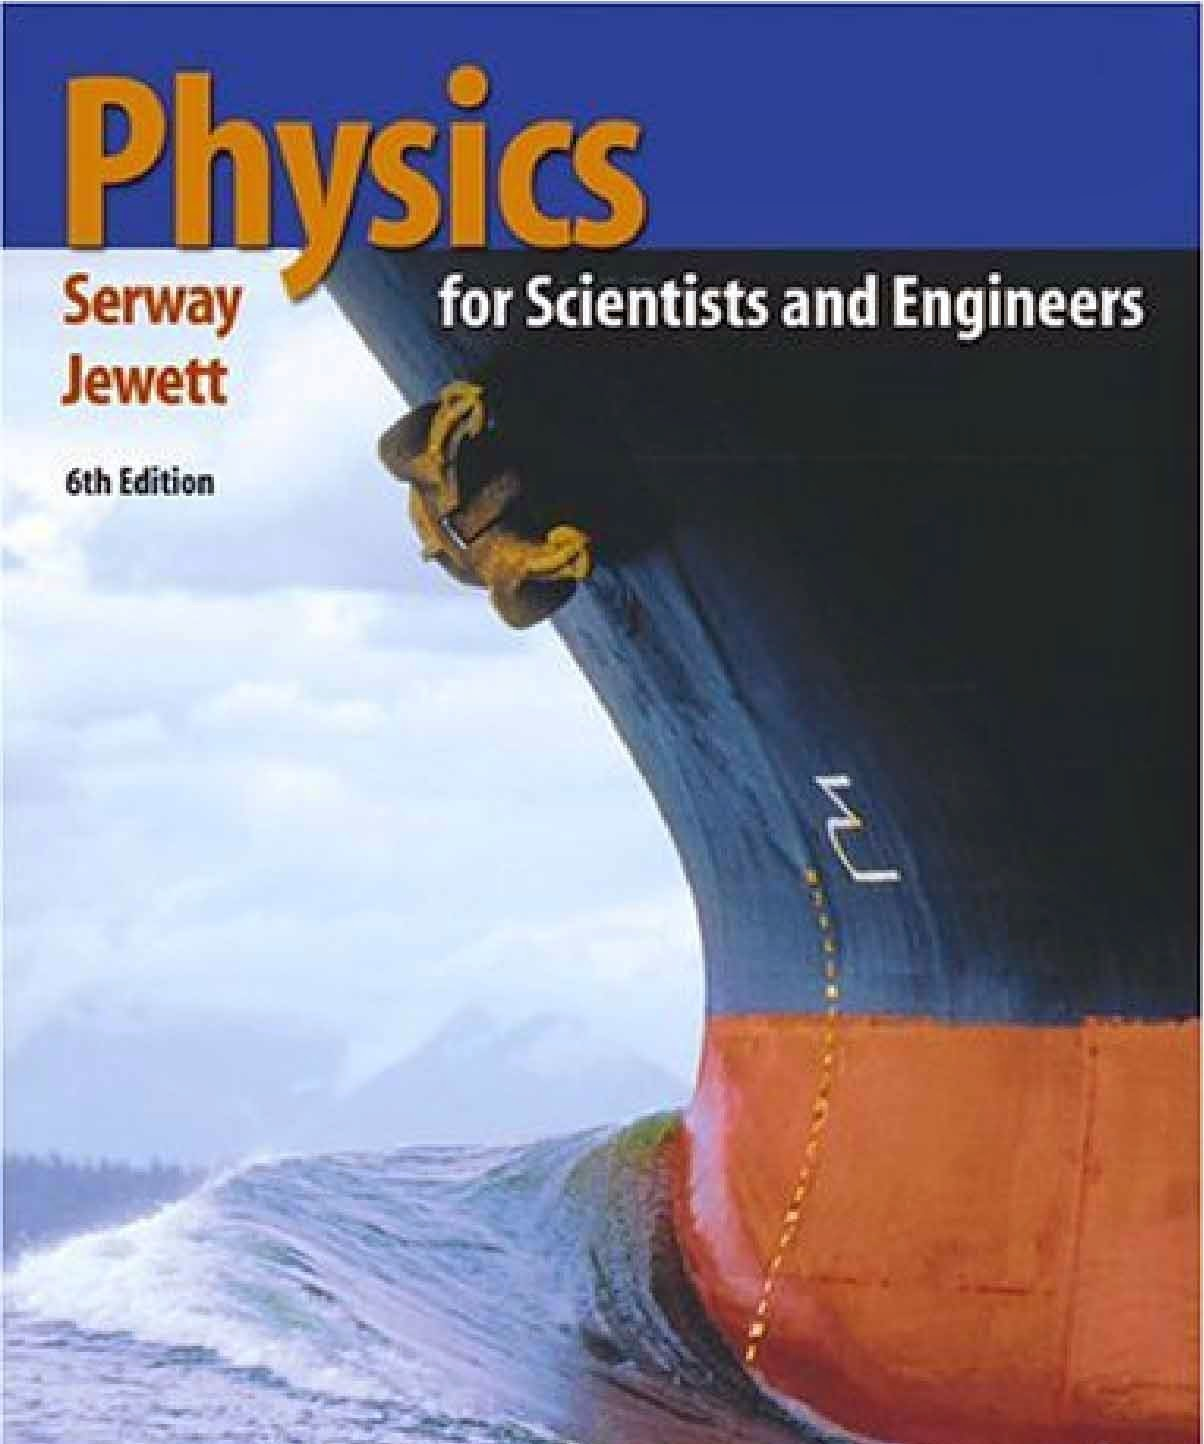 FREE PDF PHYSICS BOOKS | House of Physics